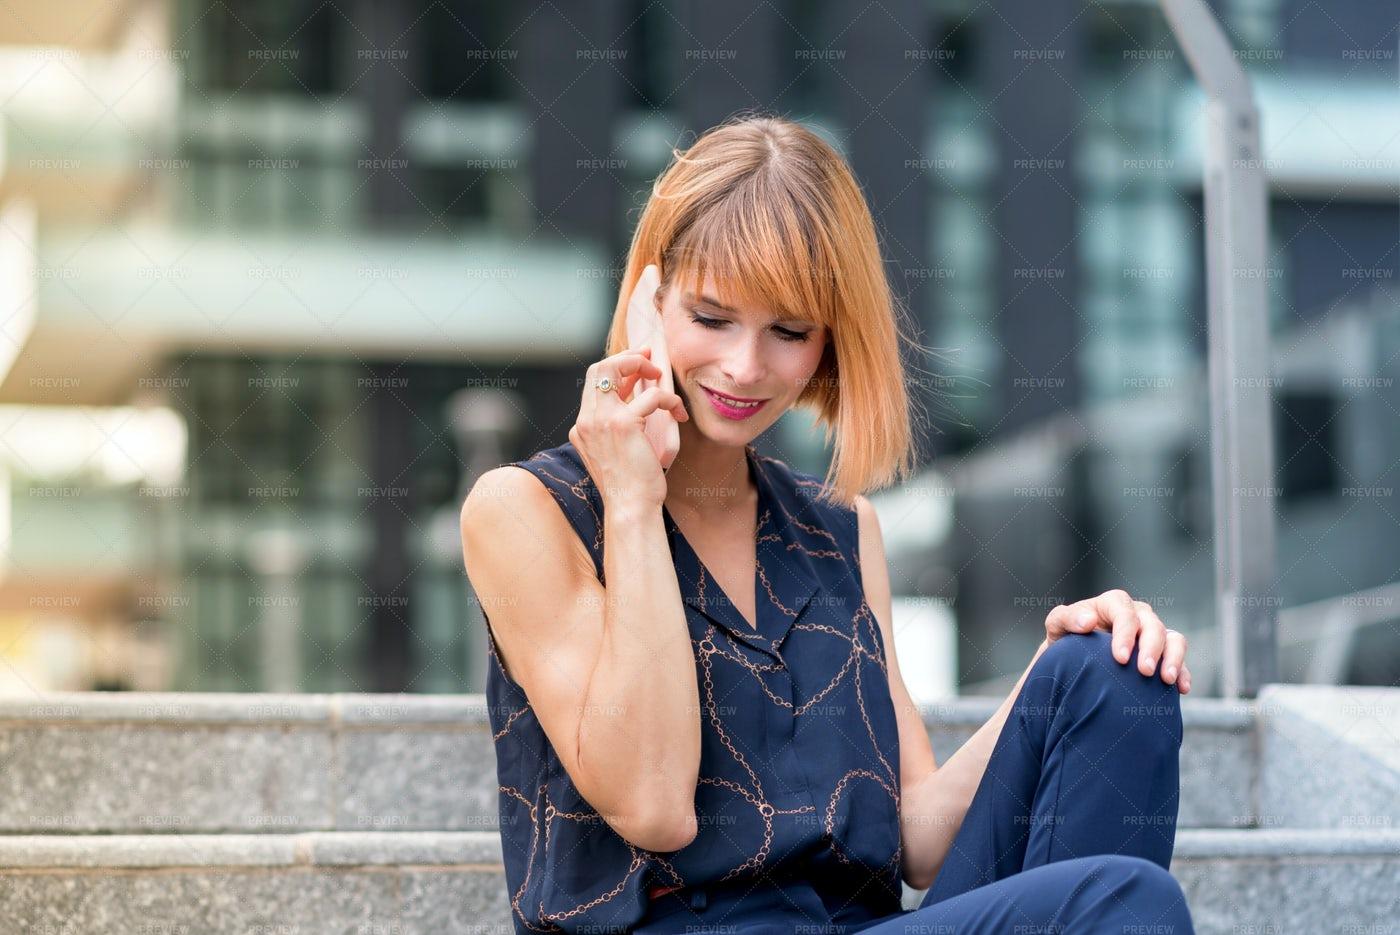 Woman Making A Call: Stock Photos